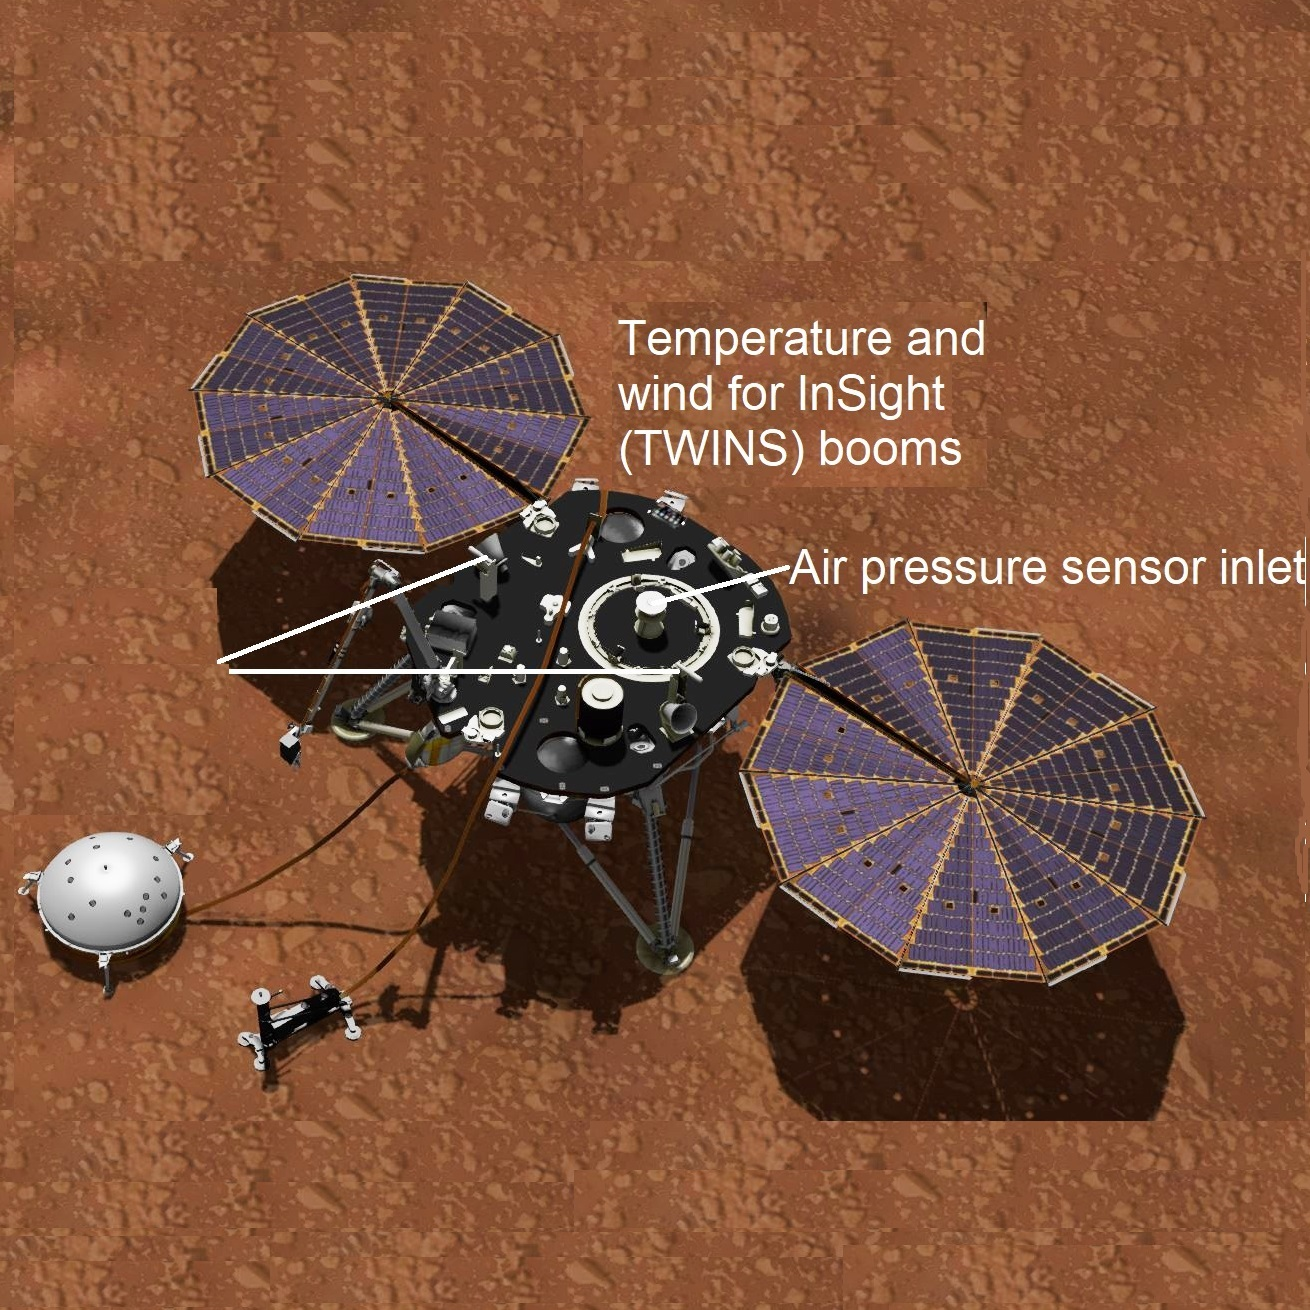 insightdatosmeteorologicos Marte